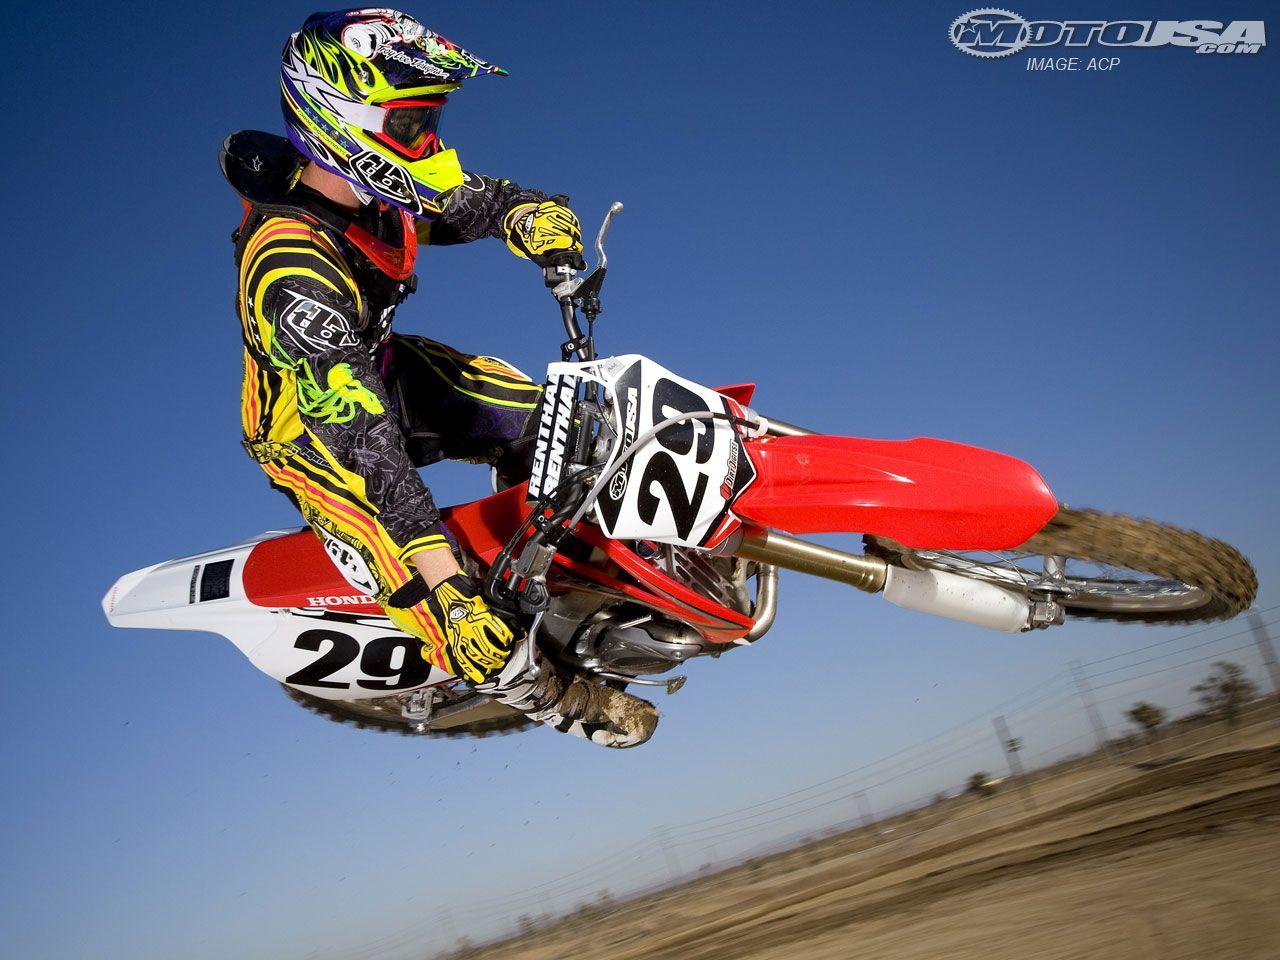 dirt bikes racing - Google Search | dirt bikes | Pinterest | Dirt ...